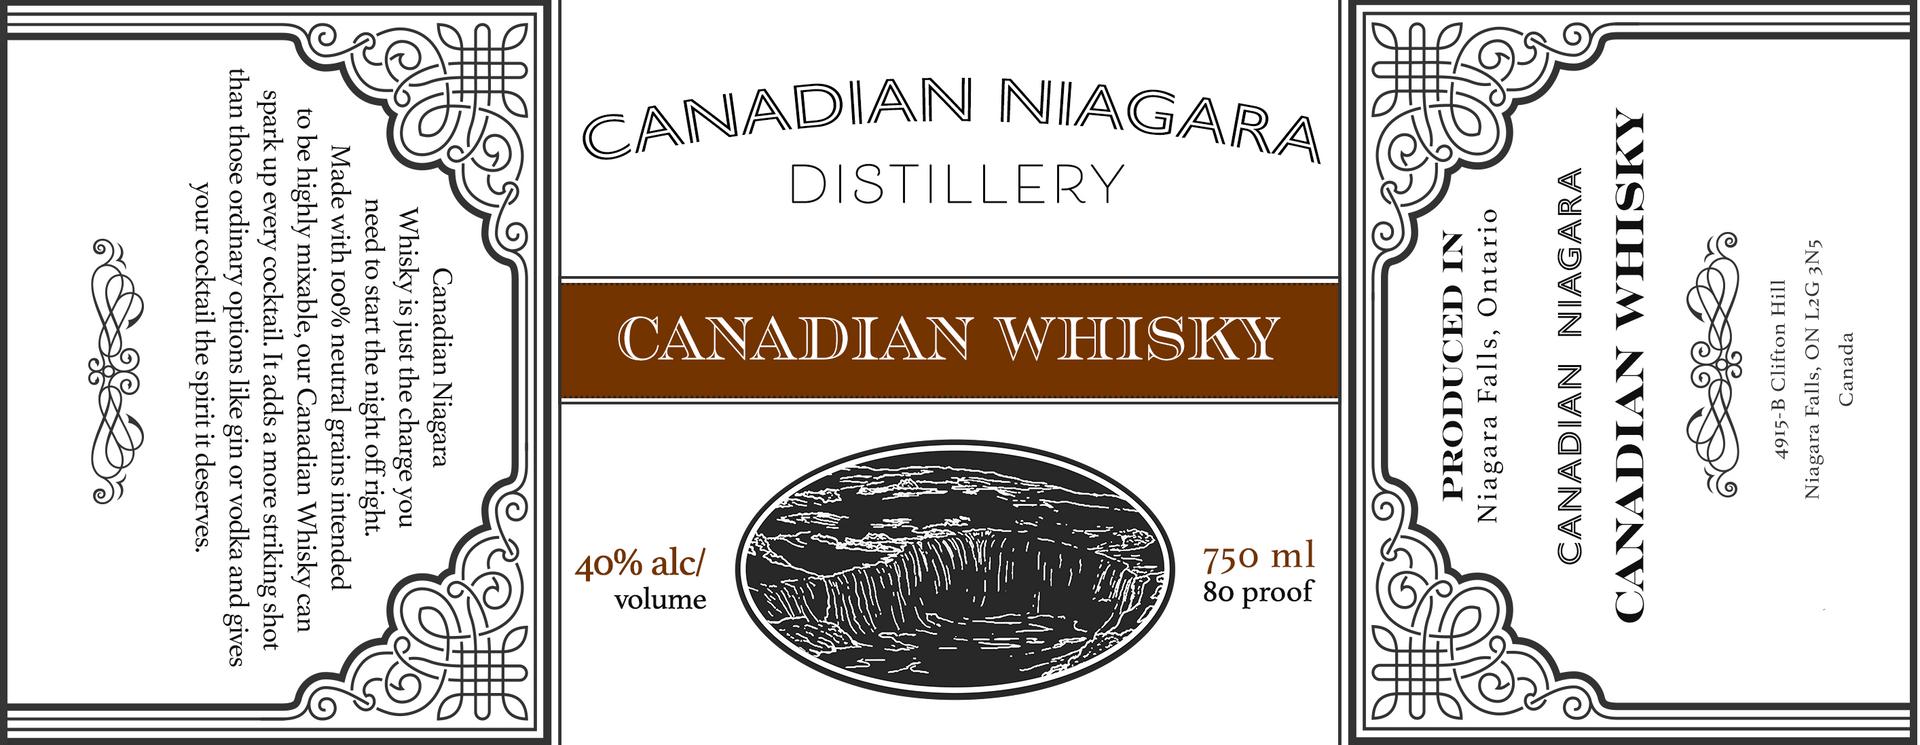 Canadian Niagara Distillery